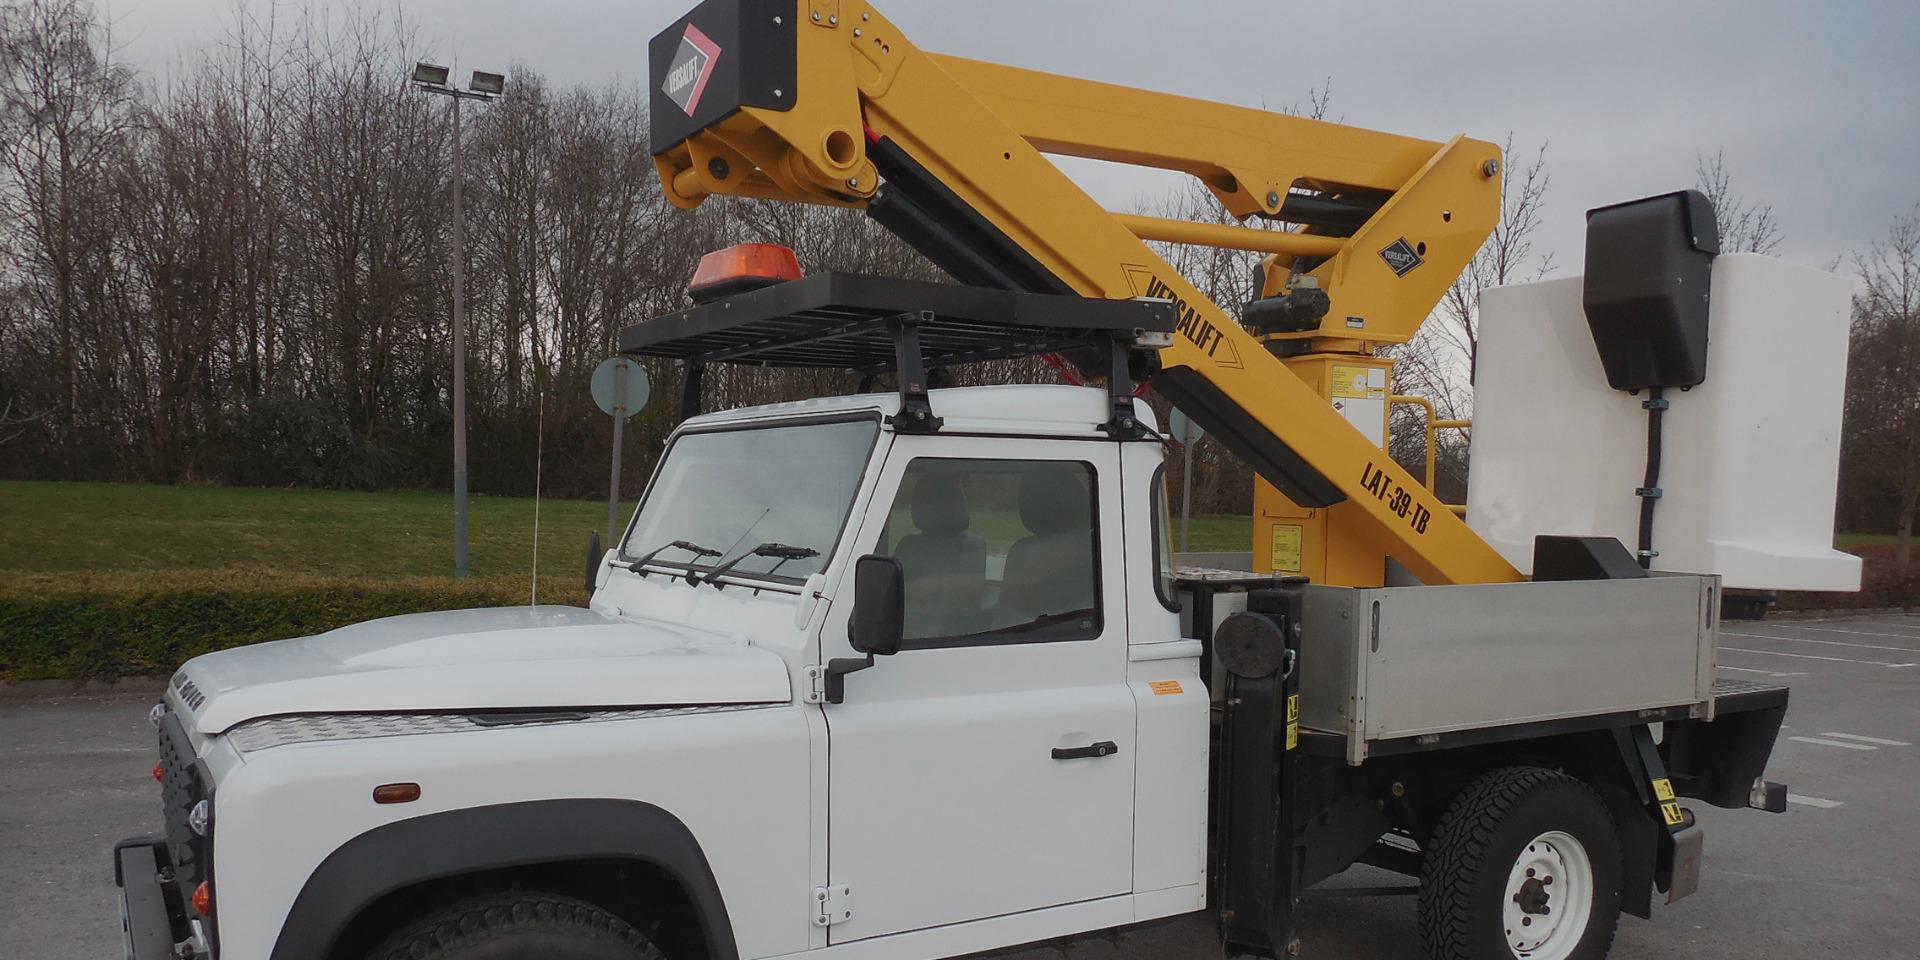 The ESCA Vehicle Maintenance Platform